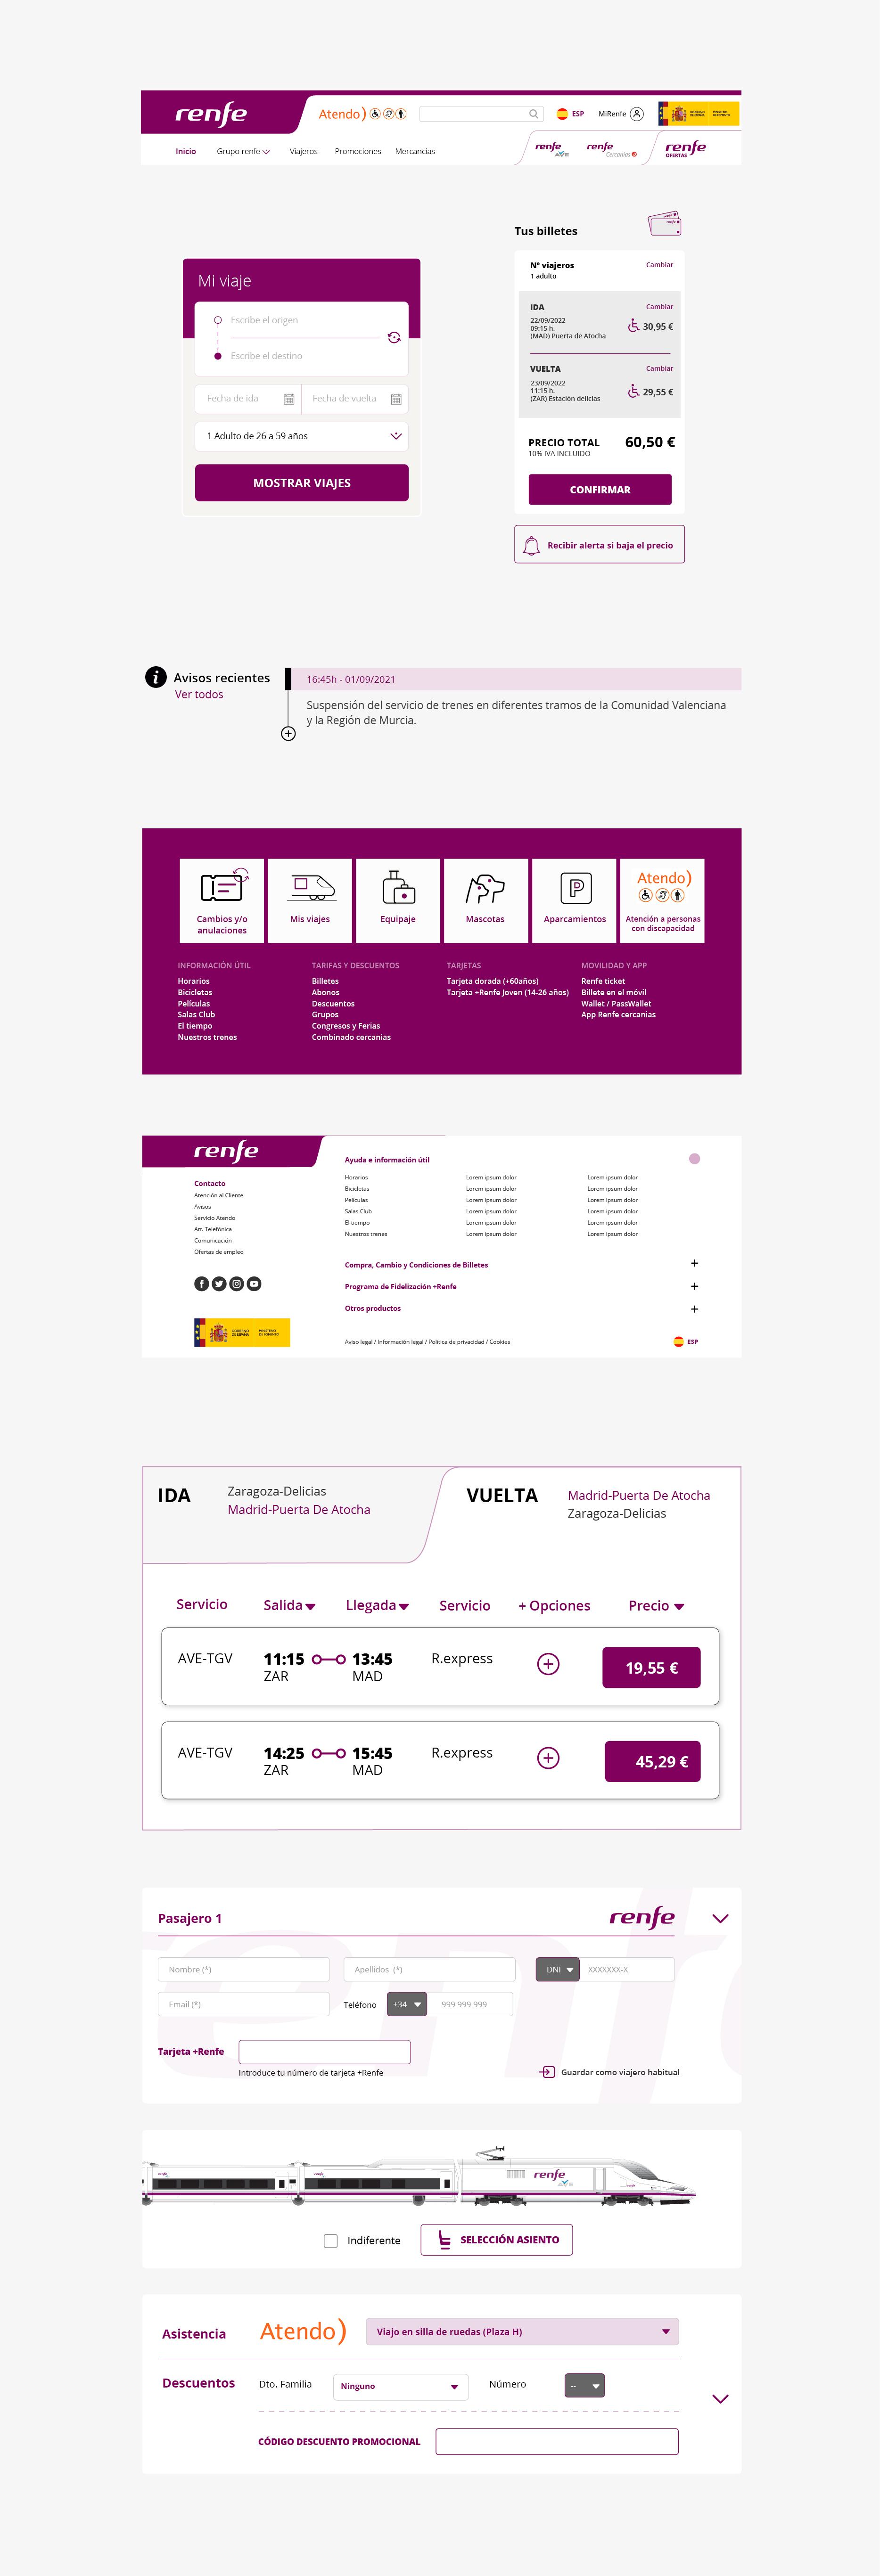 rediseño-web-renfe-diseño-nuevo-2019-20209